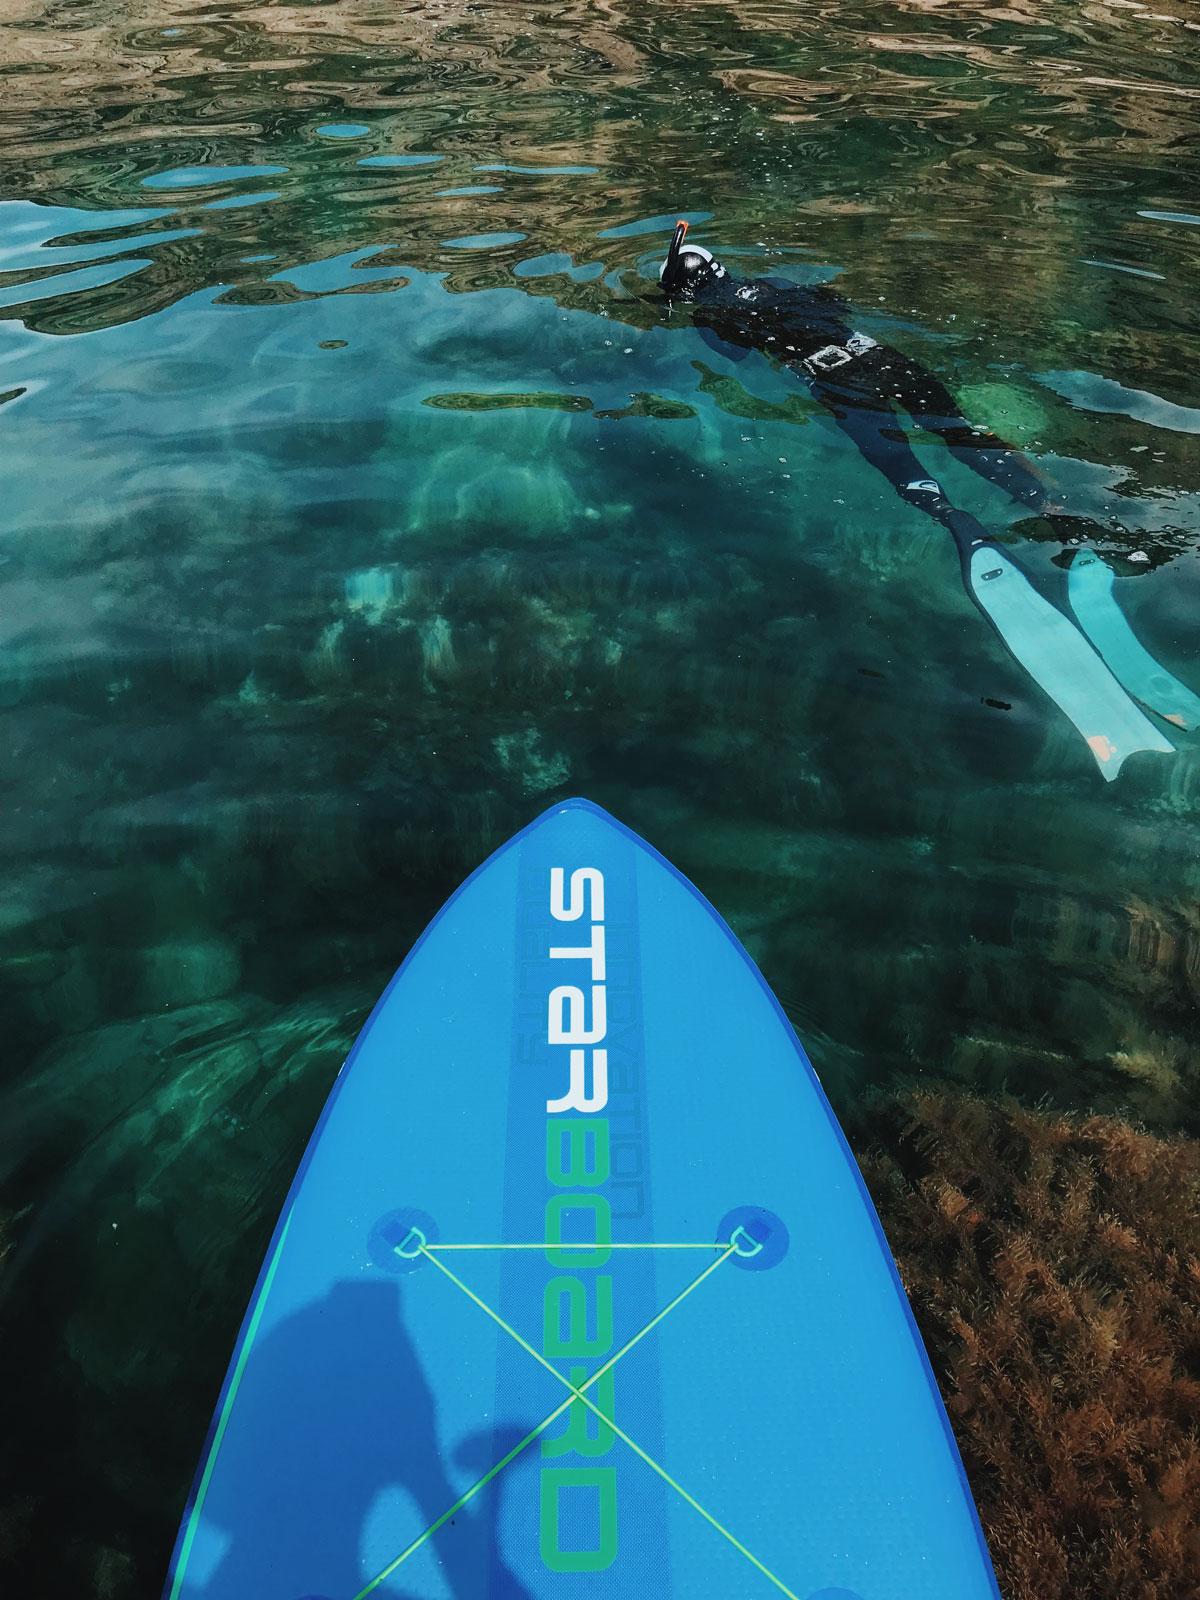 julia-karpacheva-paddleboarding-russia-black-sea-peninsula-of-crimea